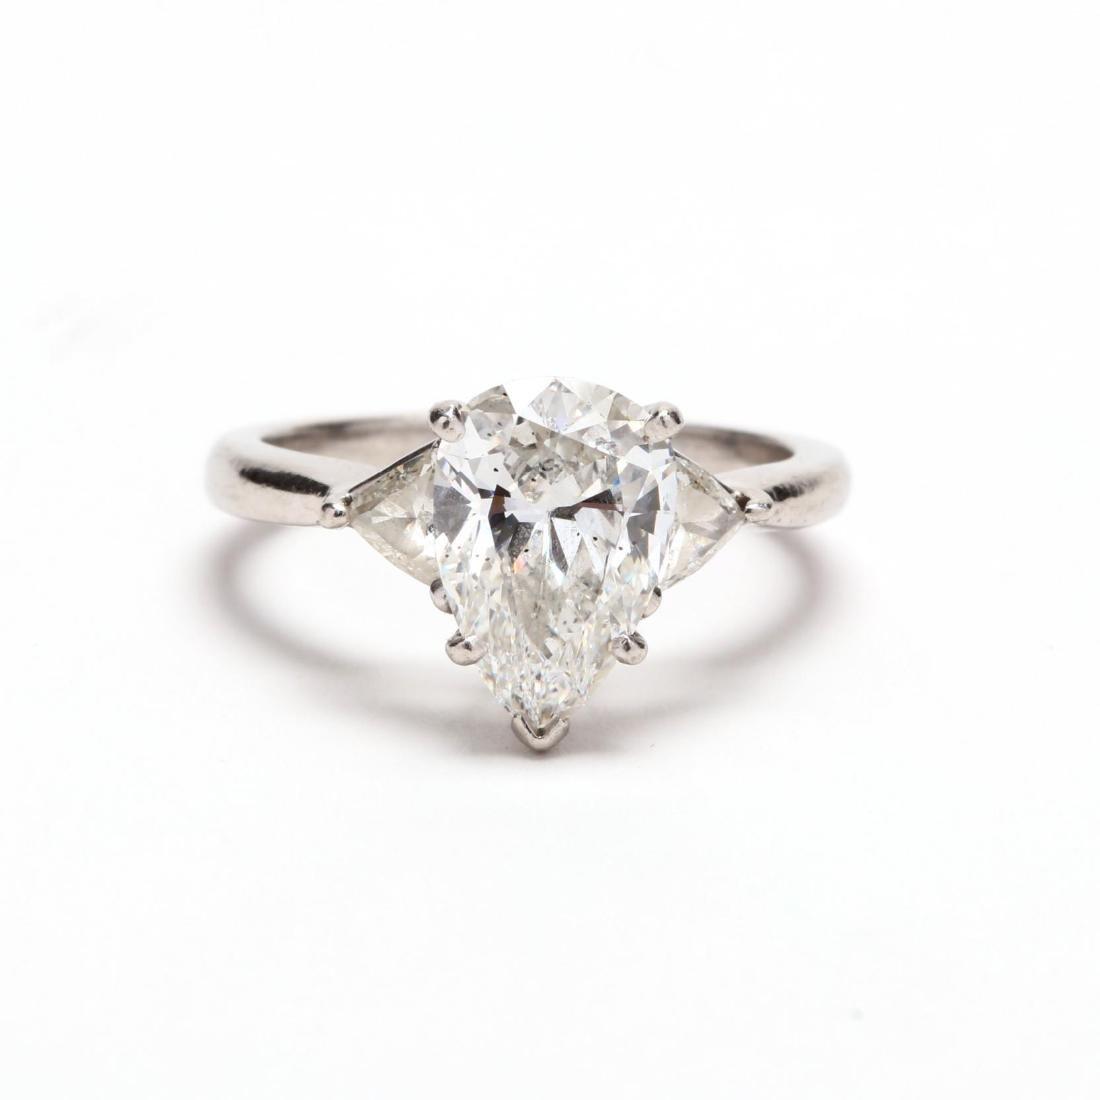 Unmounted Diamond with Platinum and Diamond Mount